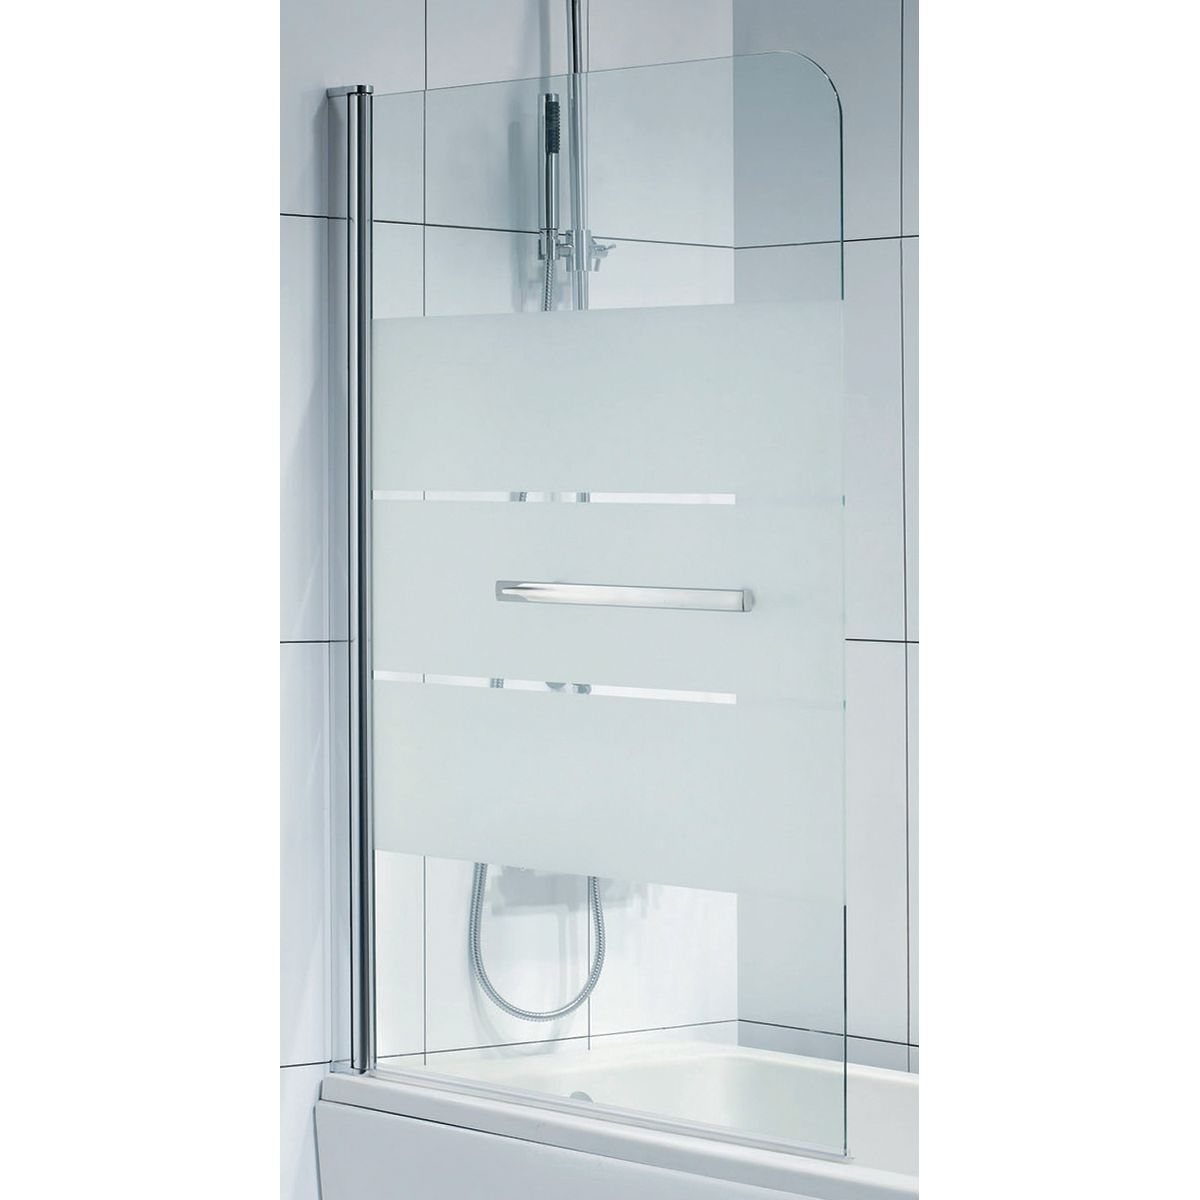 Moda vasca idromassaggio esterno leroy merlin oh24 pineglen for Leroy merlin vasca da bagno